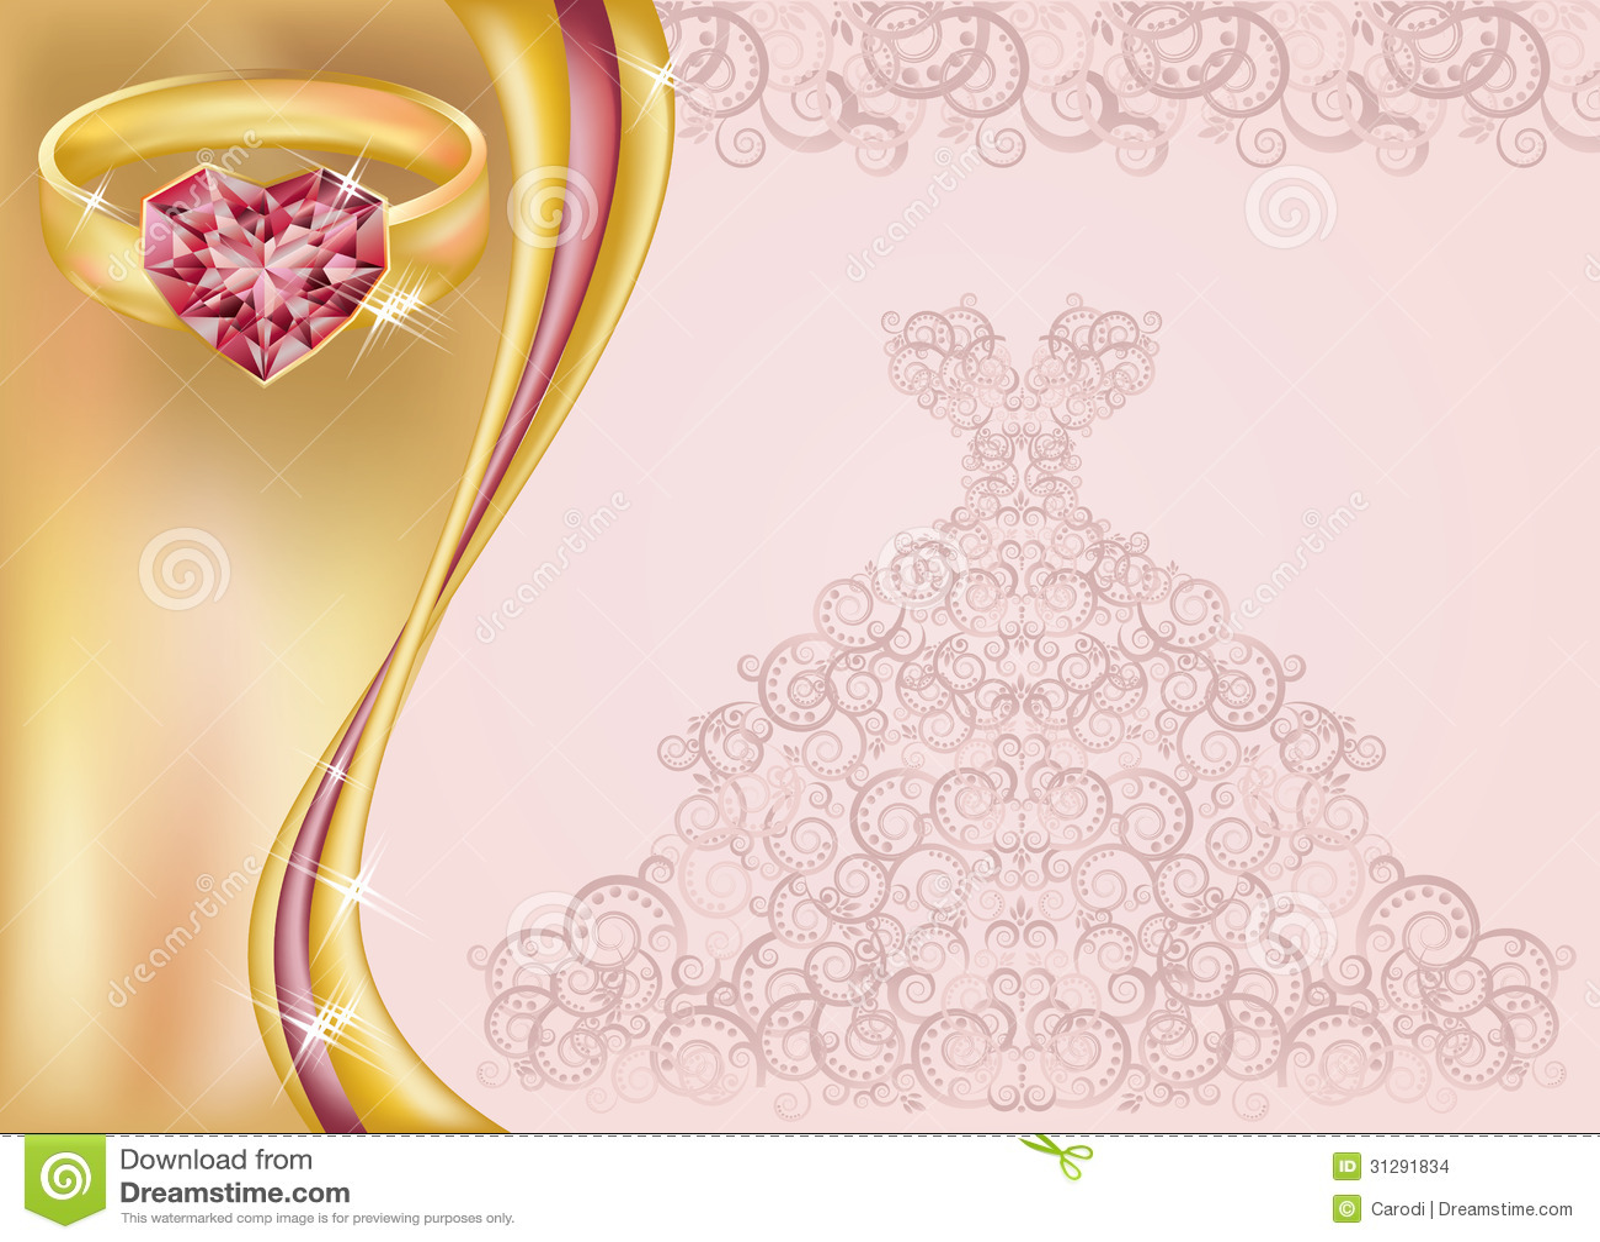 Wedding Dress Clipart Images